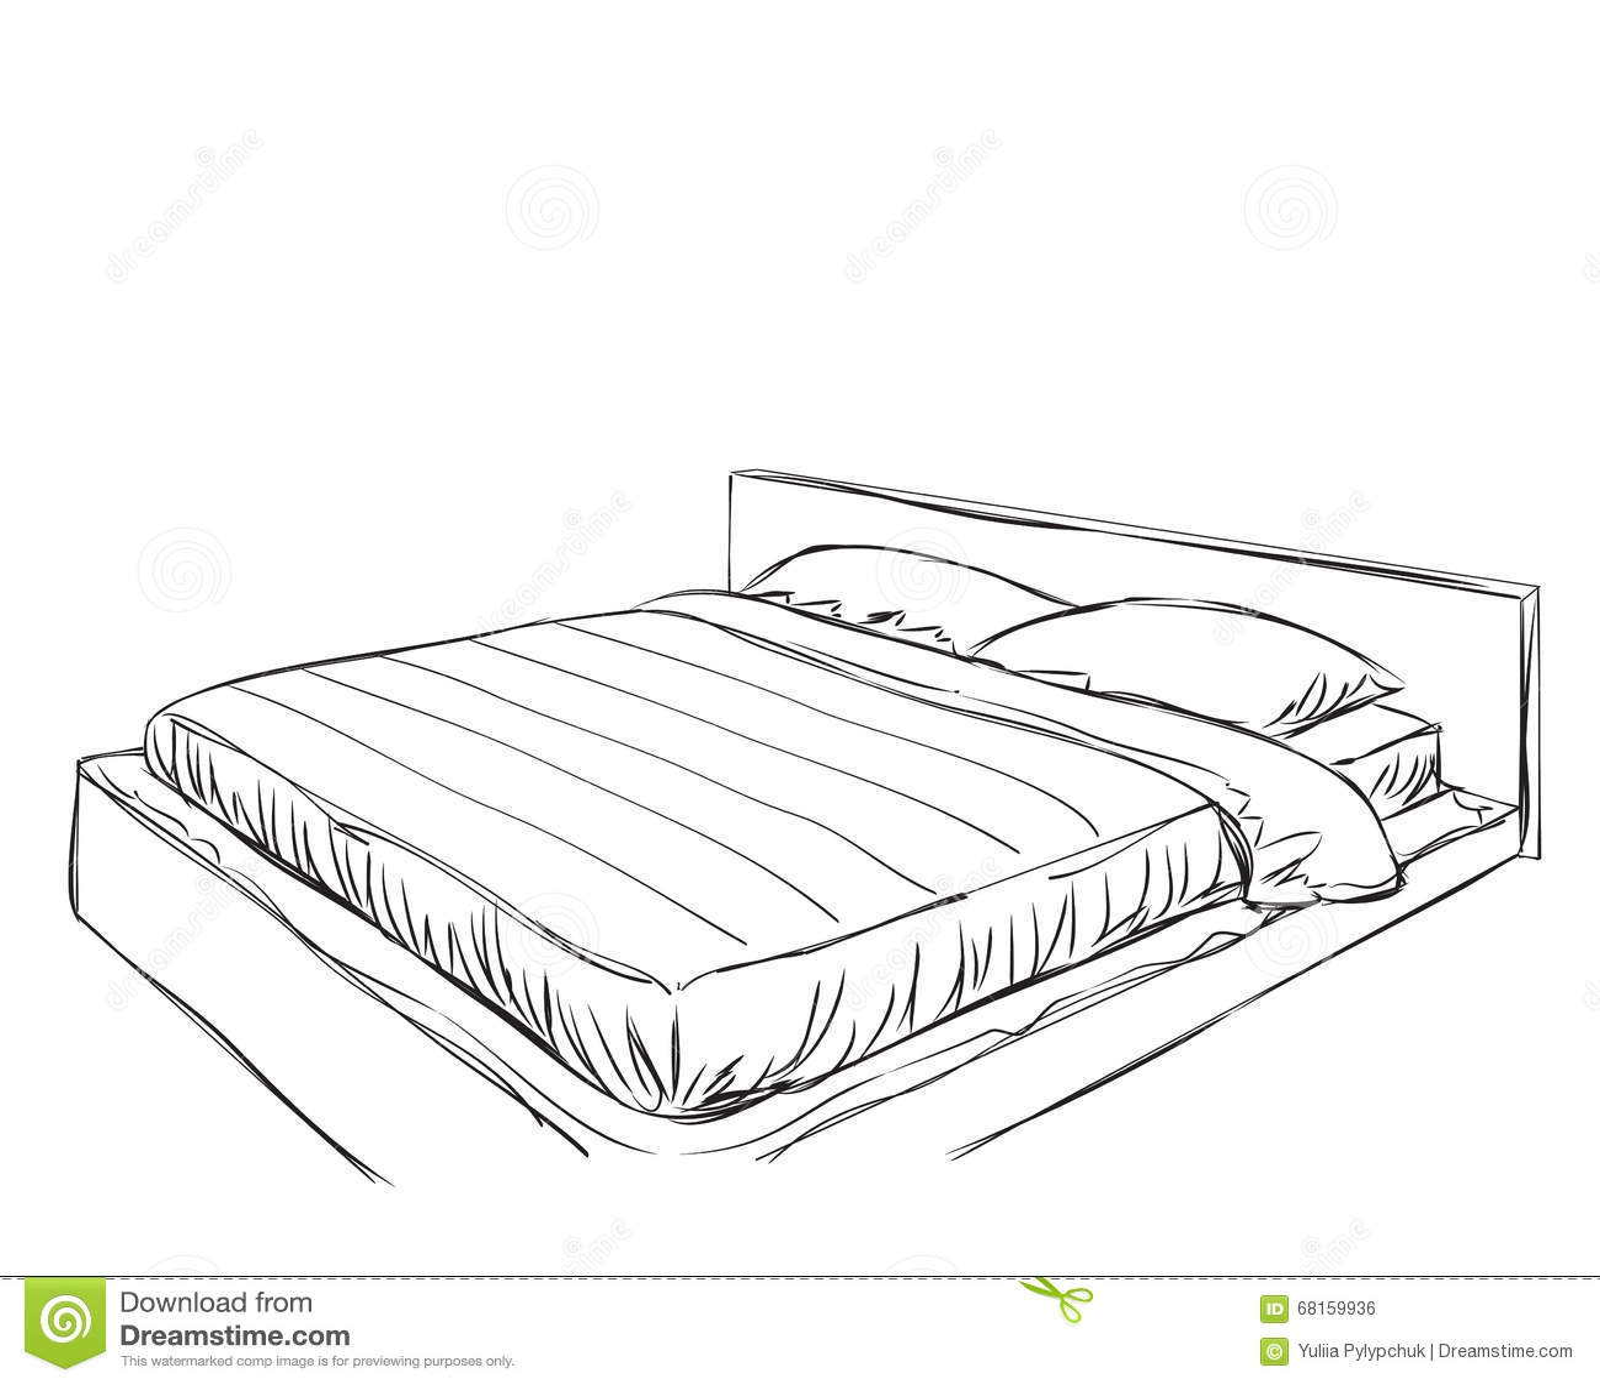 Bedroom Modern Interior Vector Drawing Sketch Cartoon